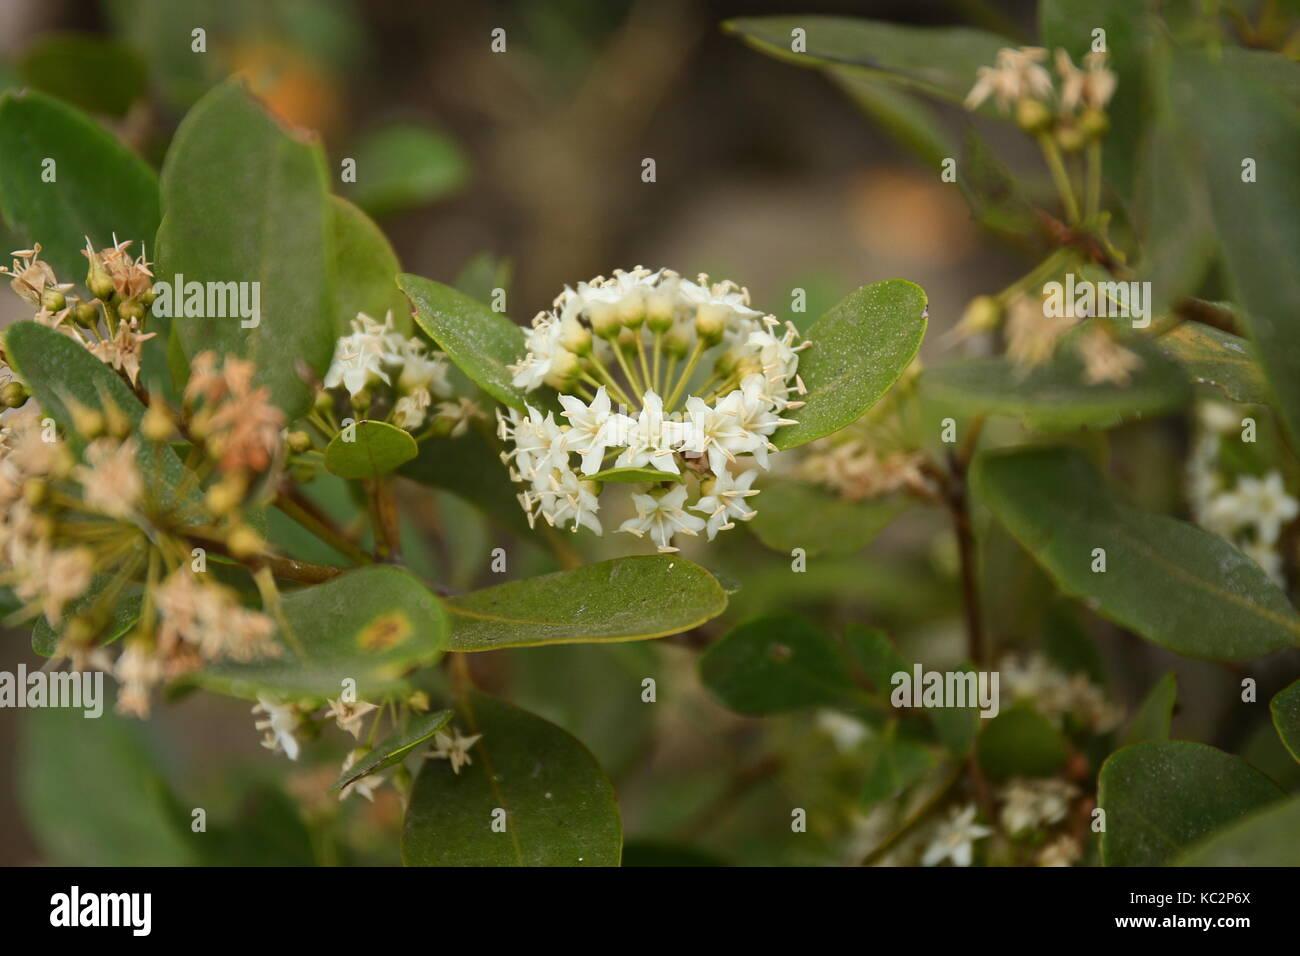 River Mangrove in Flower Stock Photo